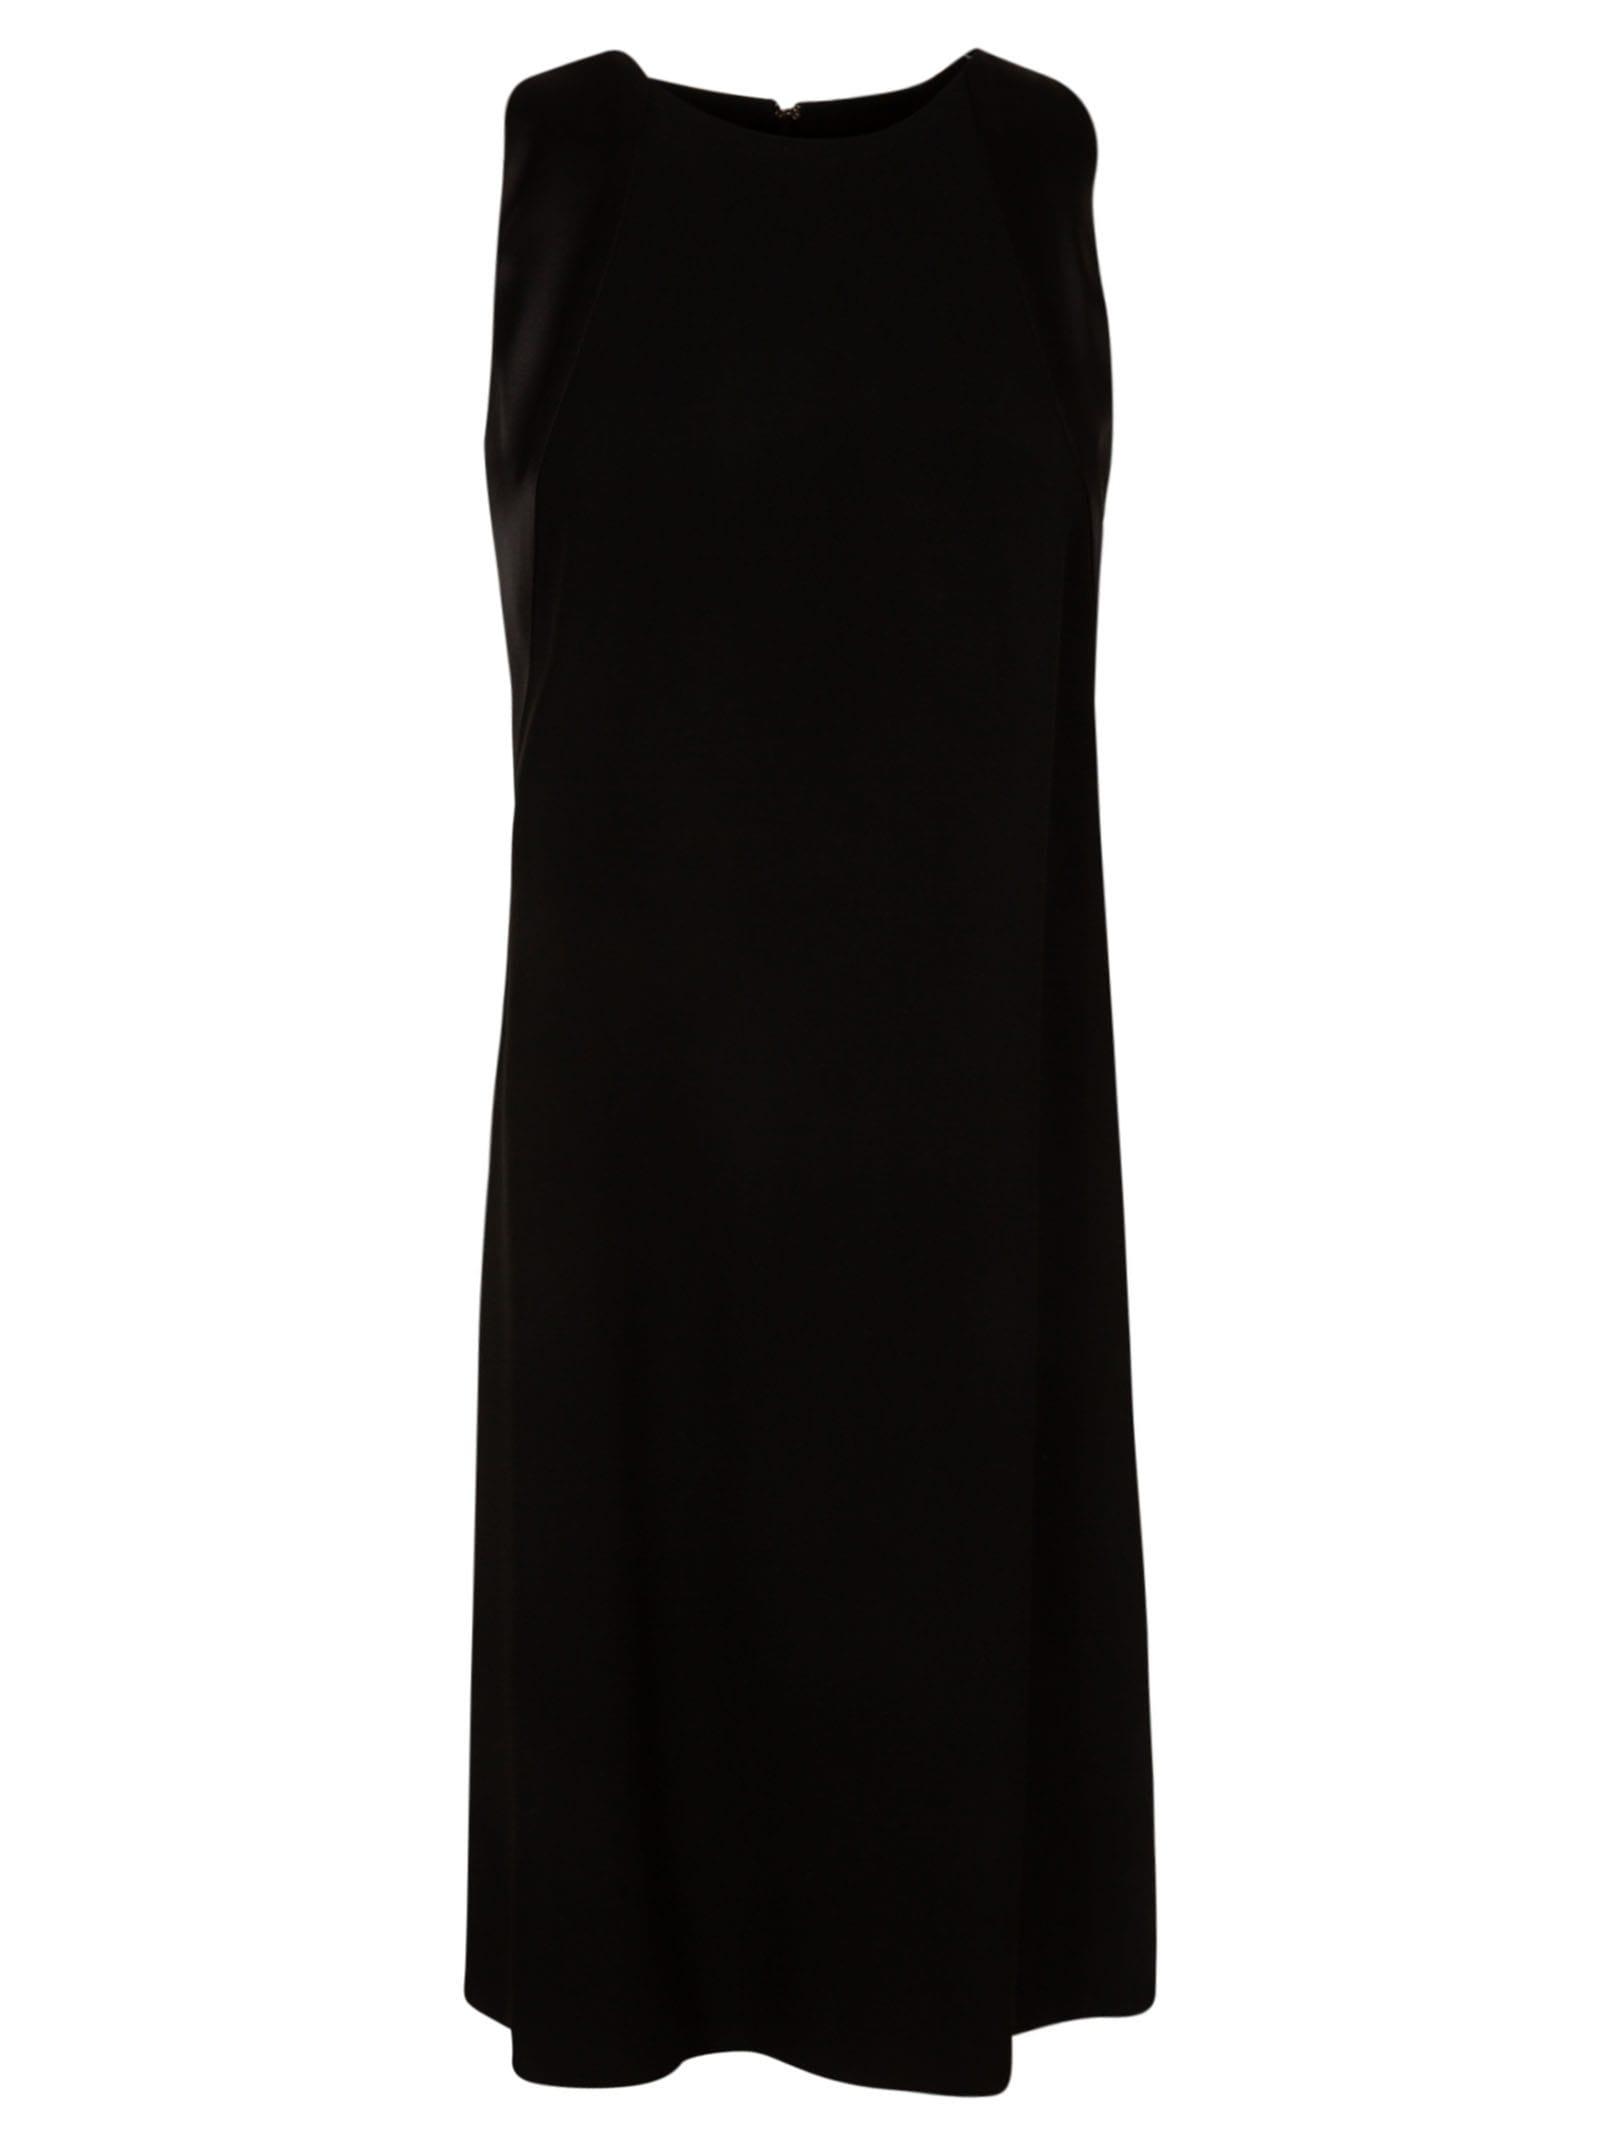 Buy Emporio Armani Sleeveless Maxi Dress online, shop Emporio Armani with free shipping